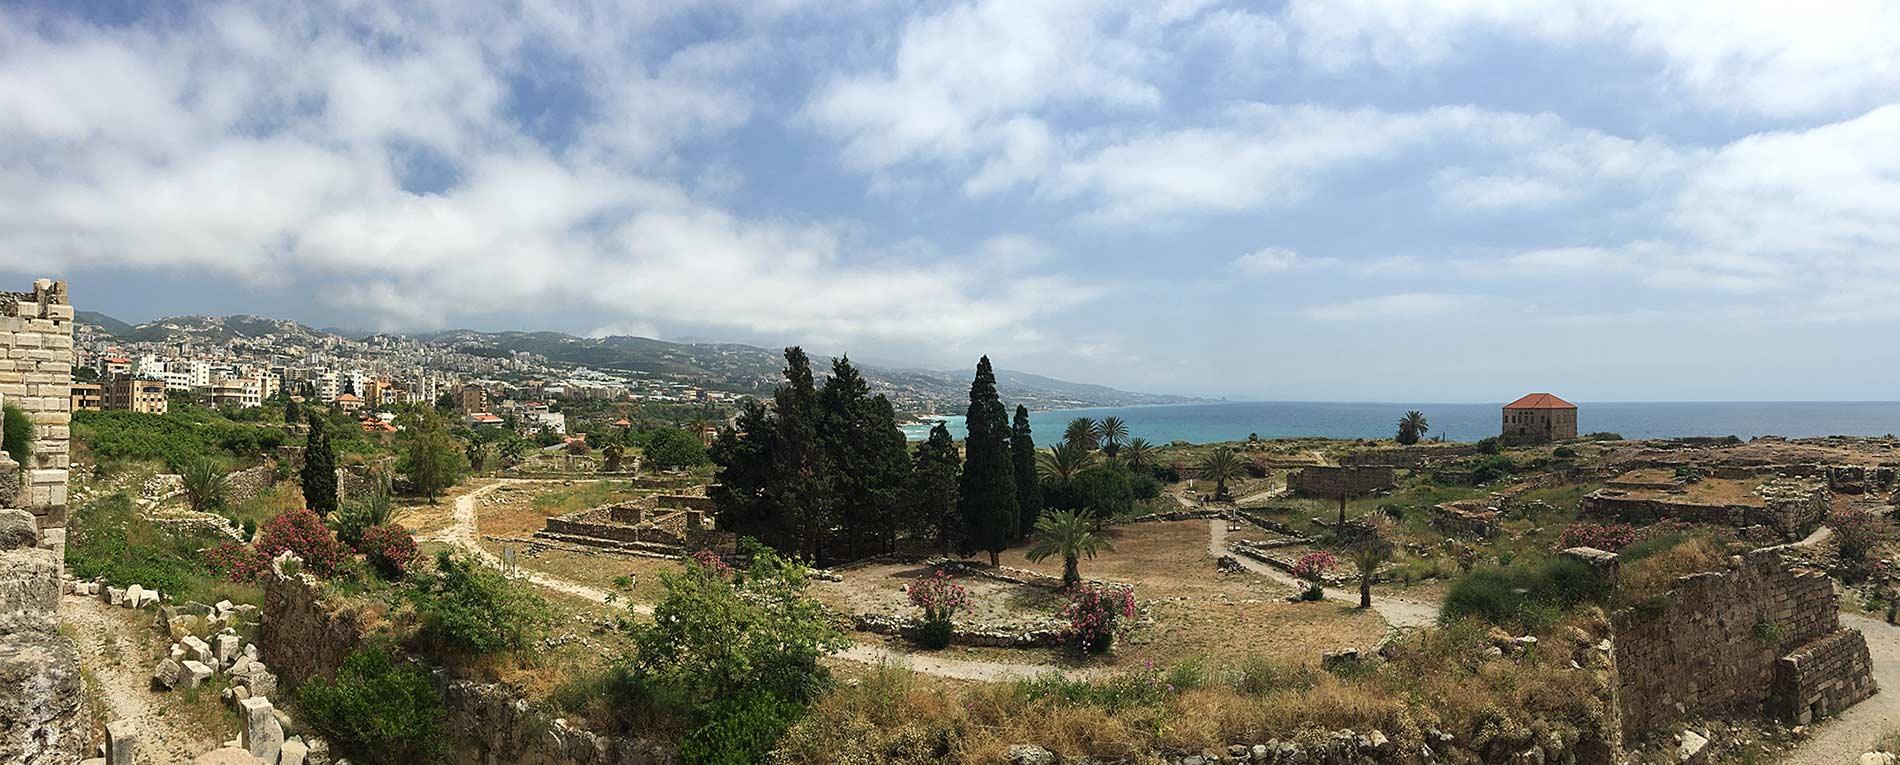 Byblos Kalesinden manzara. Fotoğraf: Umur Dilek